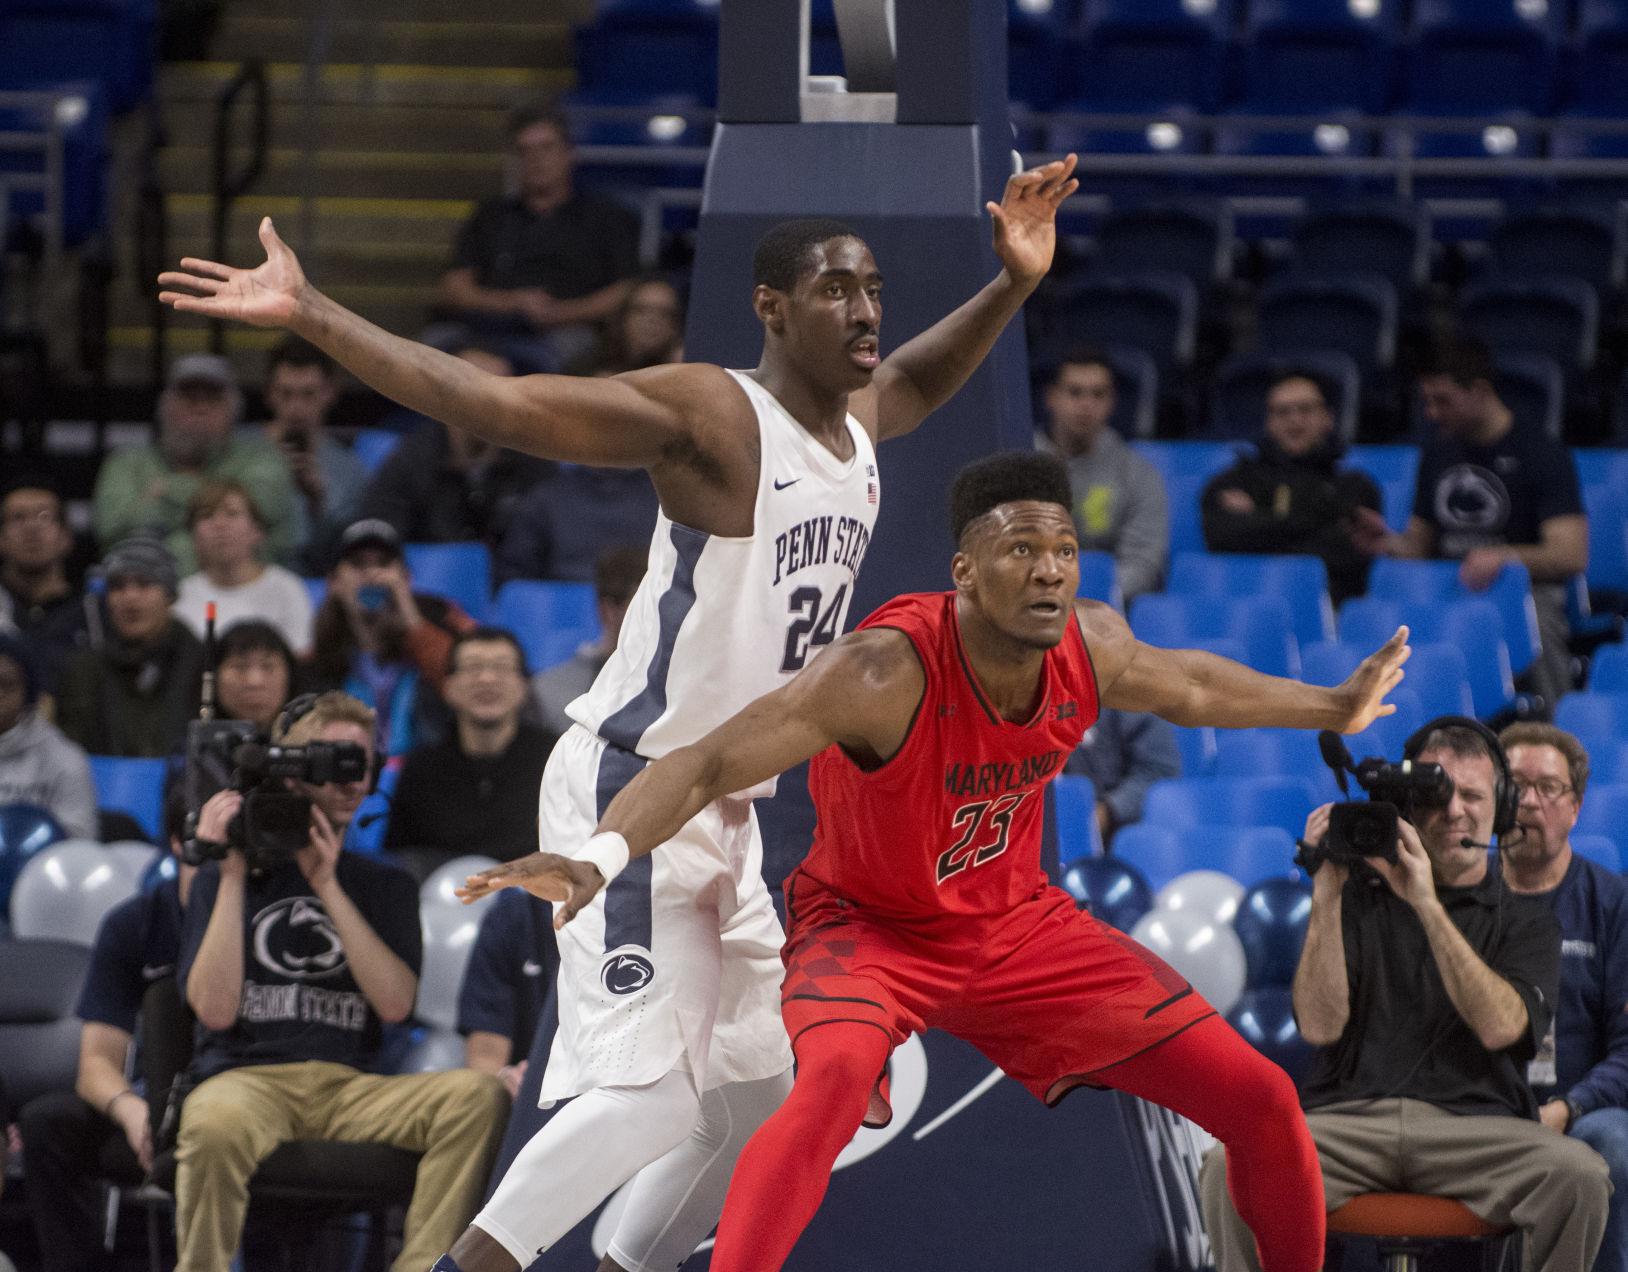 Menu0027s Basketball vs Maryland Penn State menu0027s